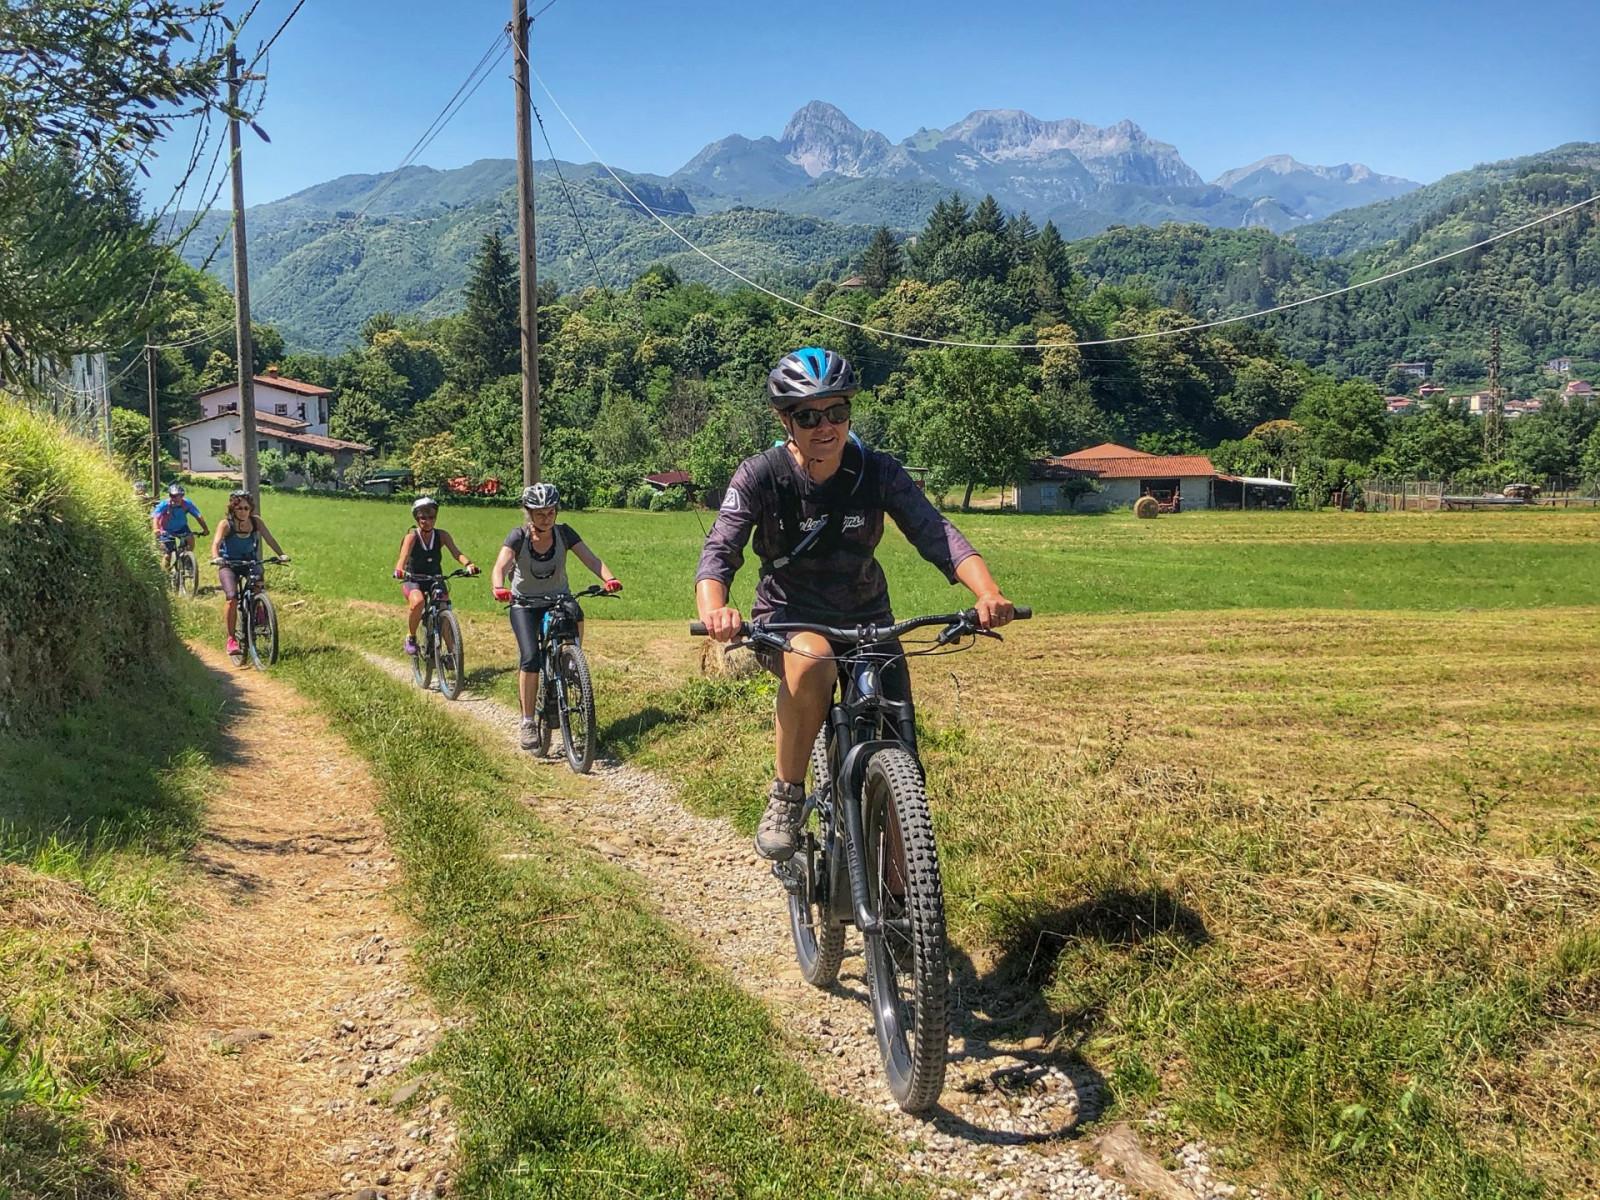 Escursione in MTB elettrica in Garfagnana